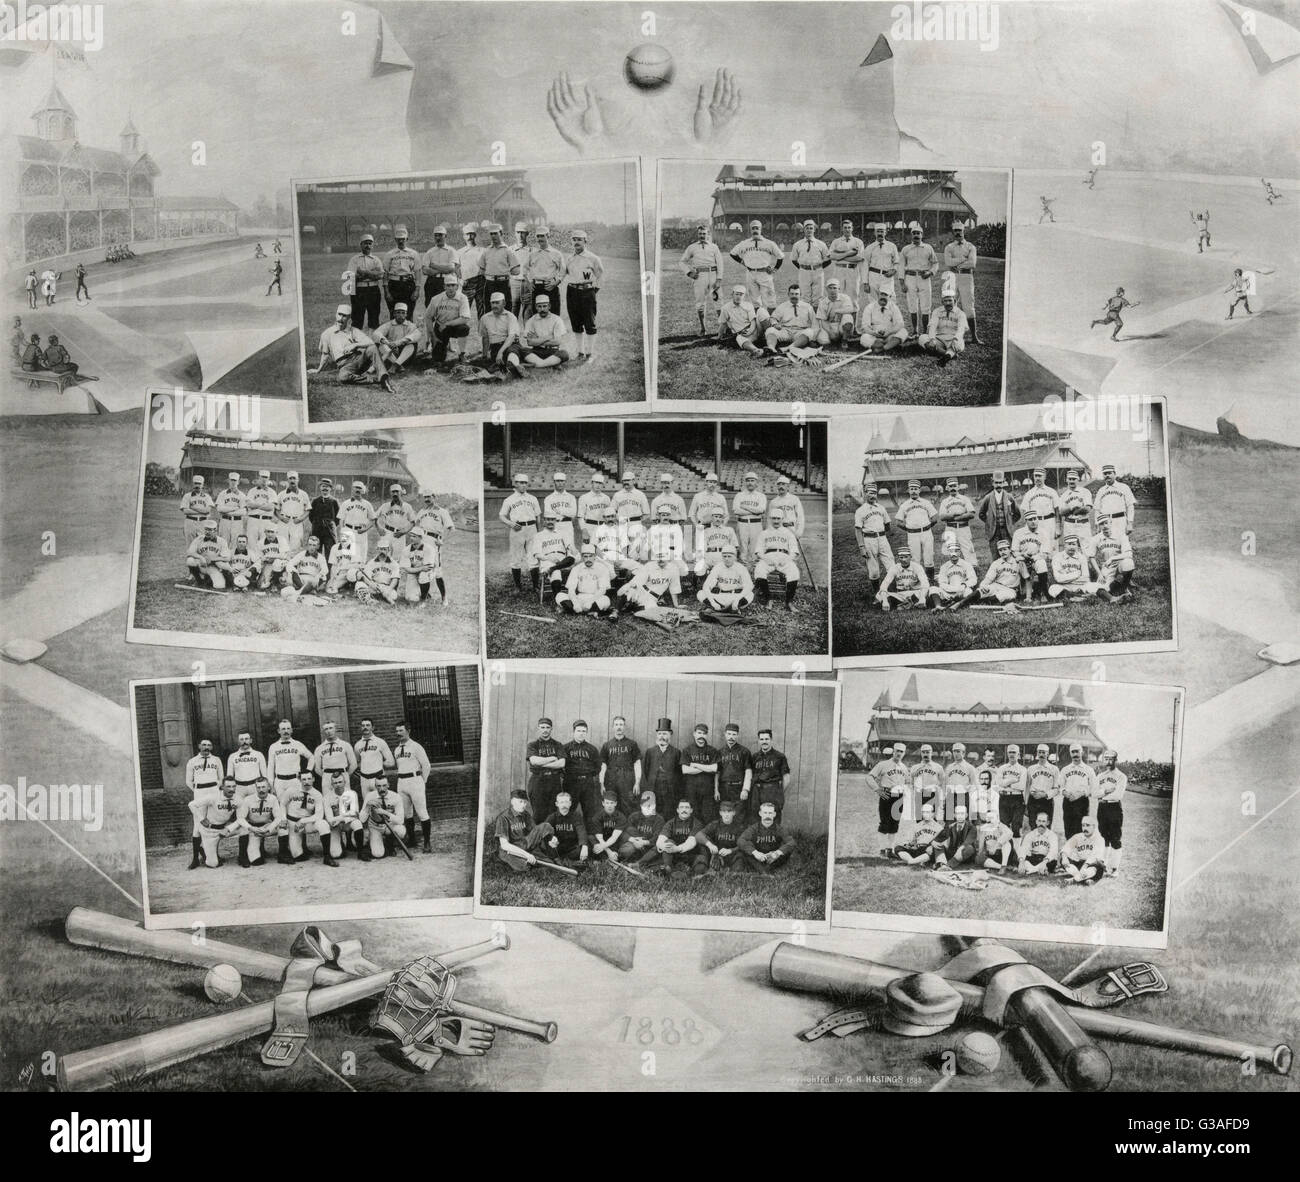 Galaxy of the National League. Print shows photomontage of eight National League baseball teams: Washington Nationals, - Stock Image